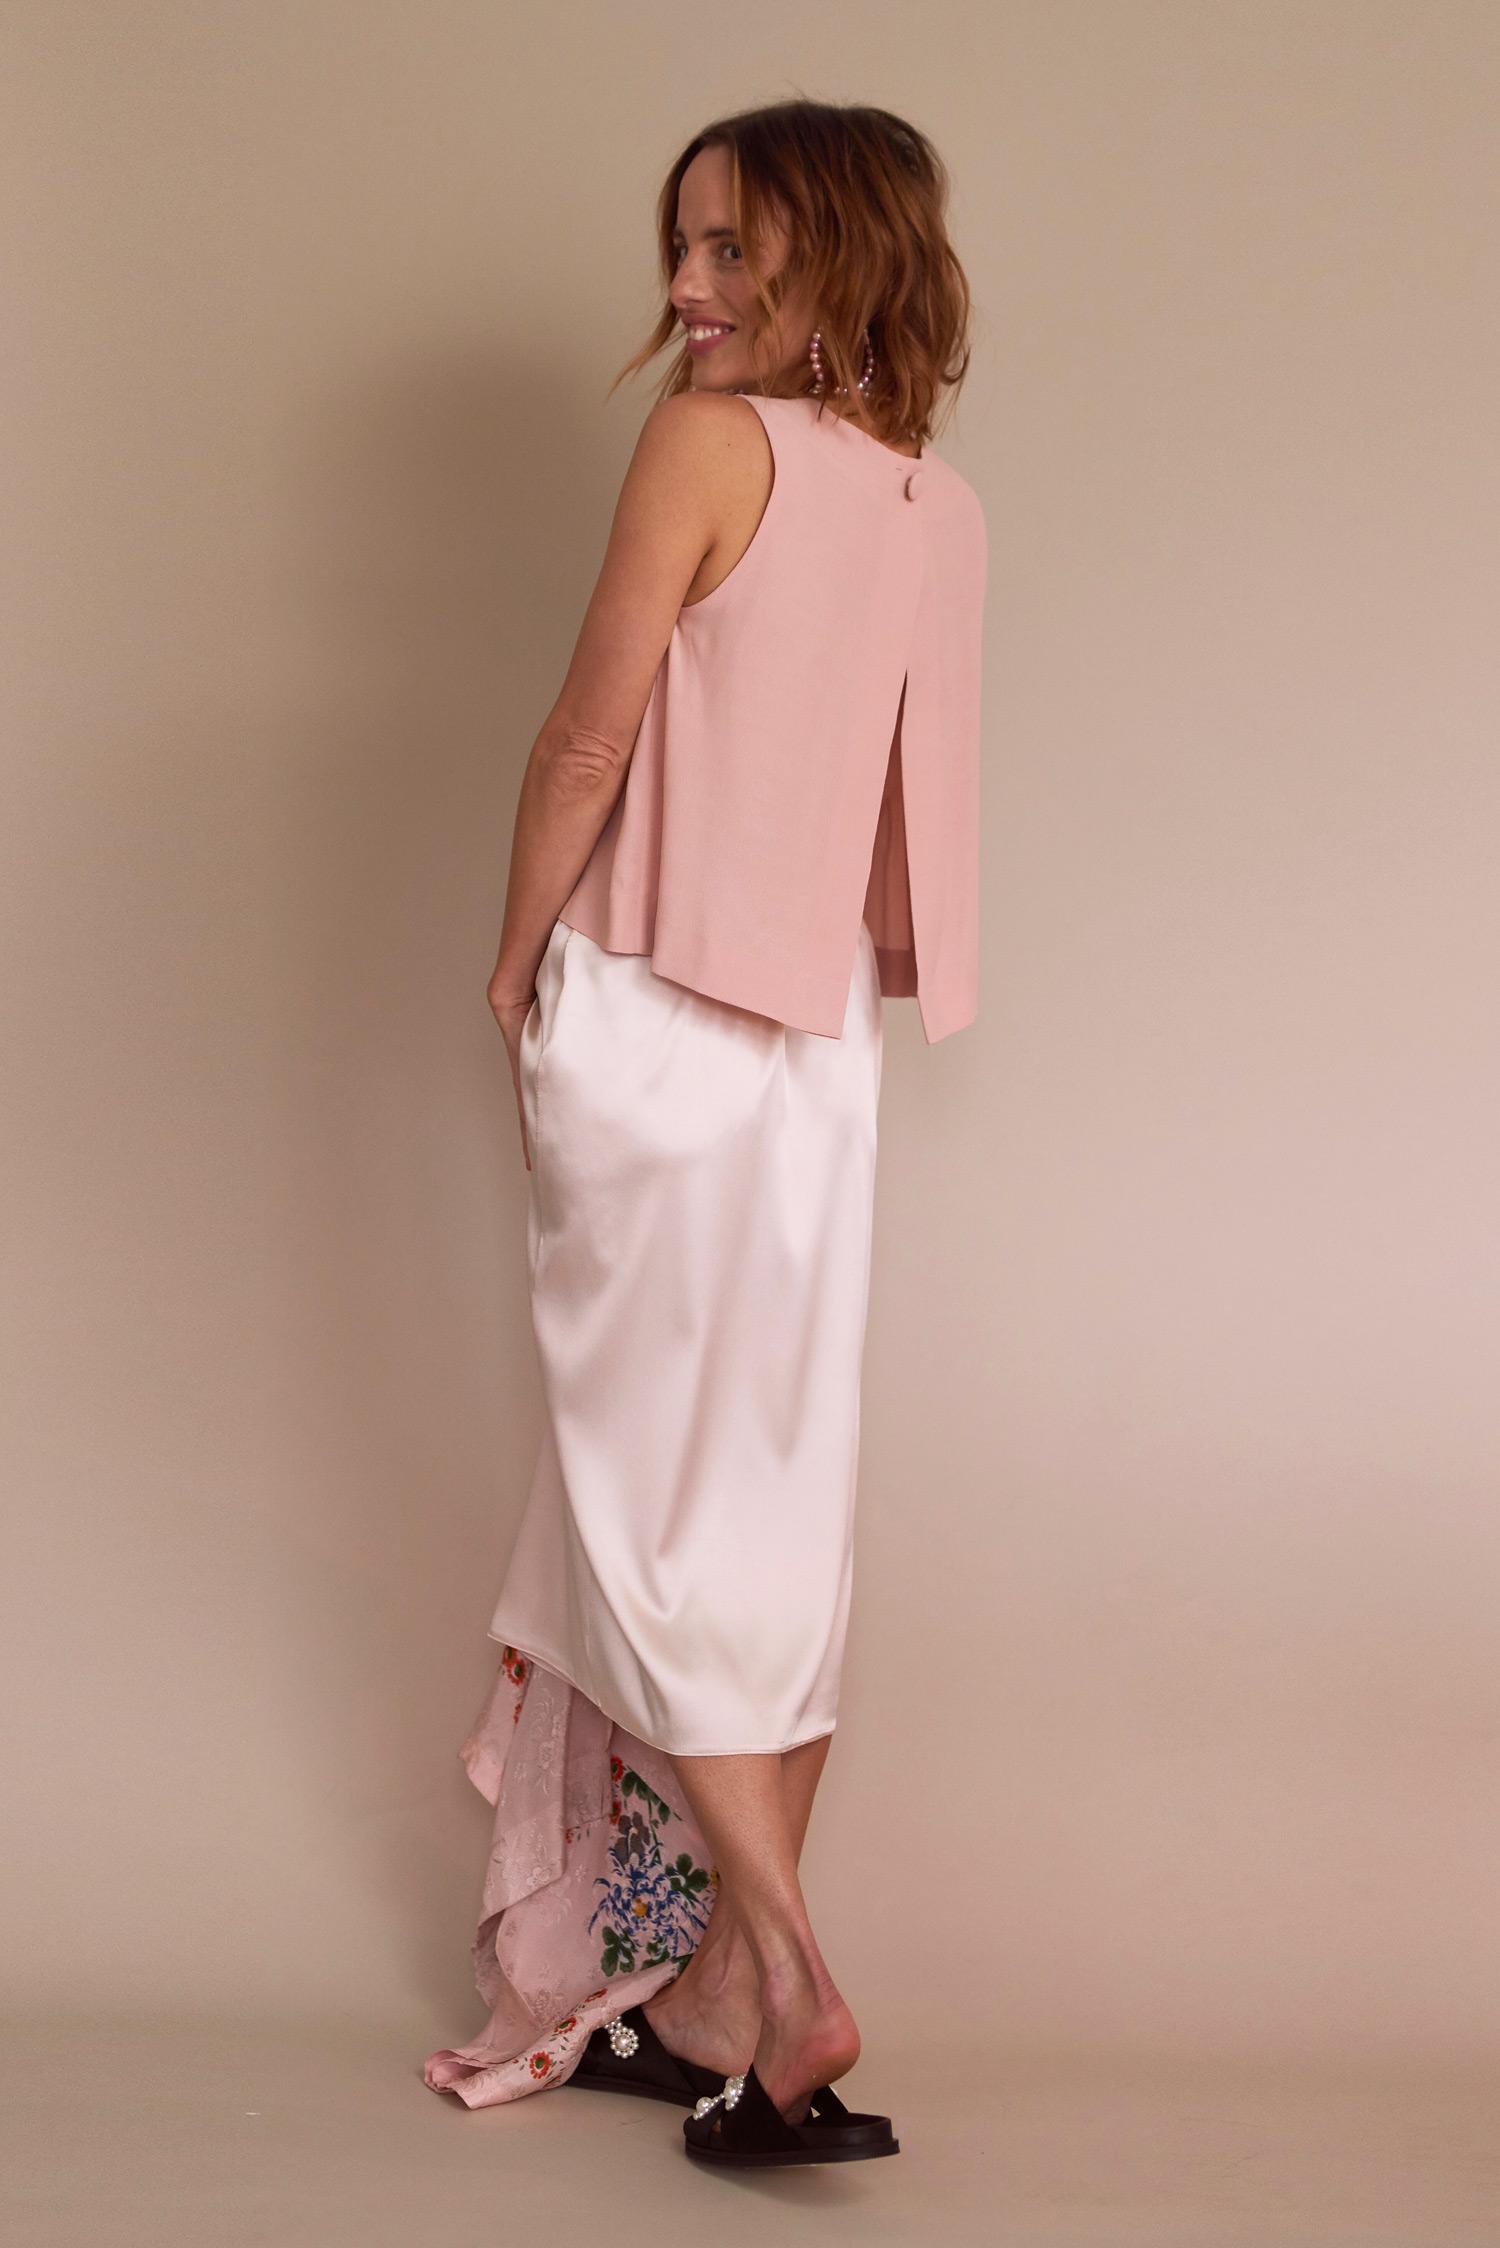 Rosa Macher Sleeveless Top 001 in Blush and Slip Skirt 001 in Pearl